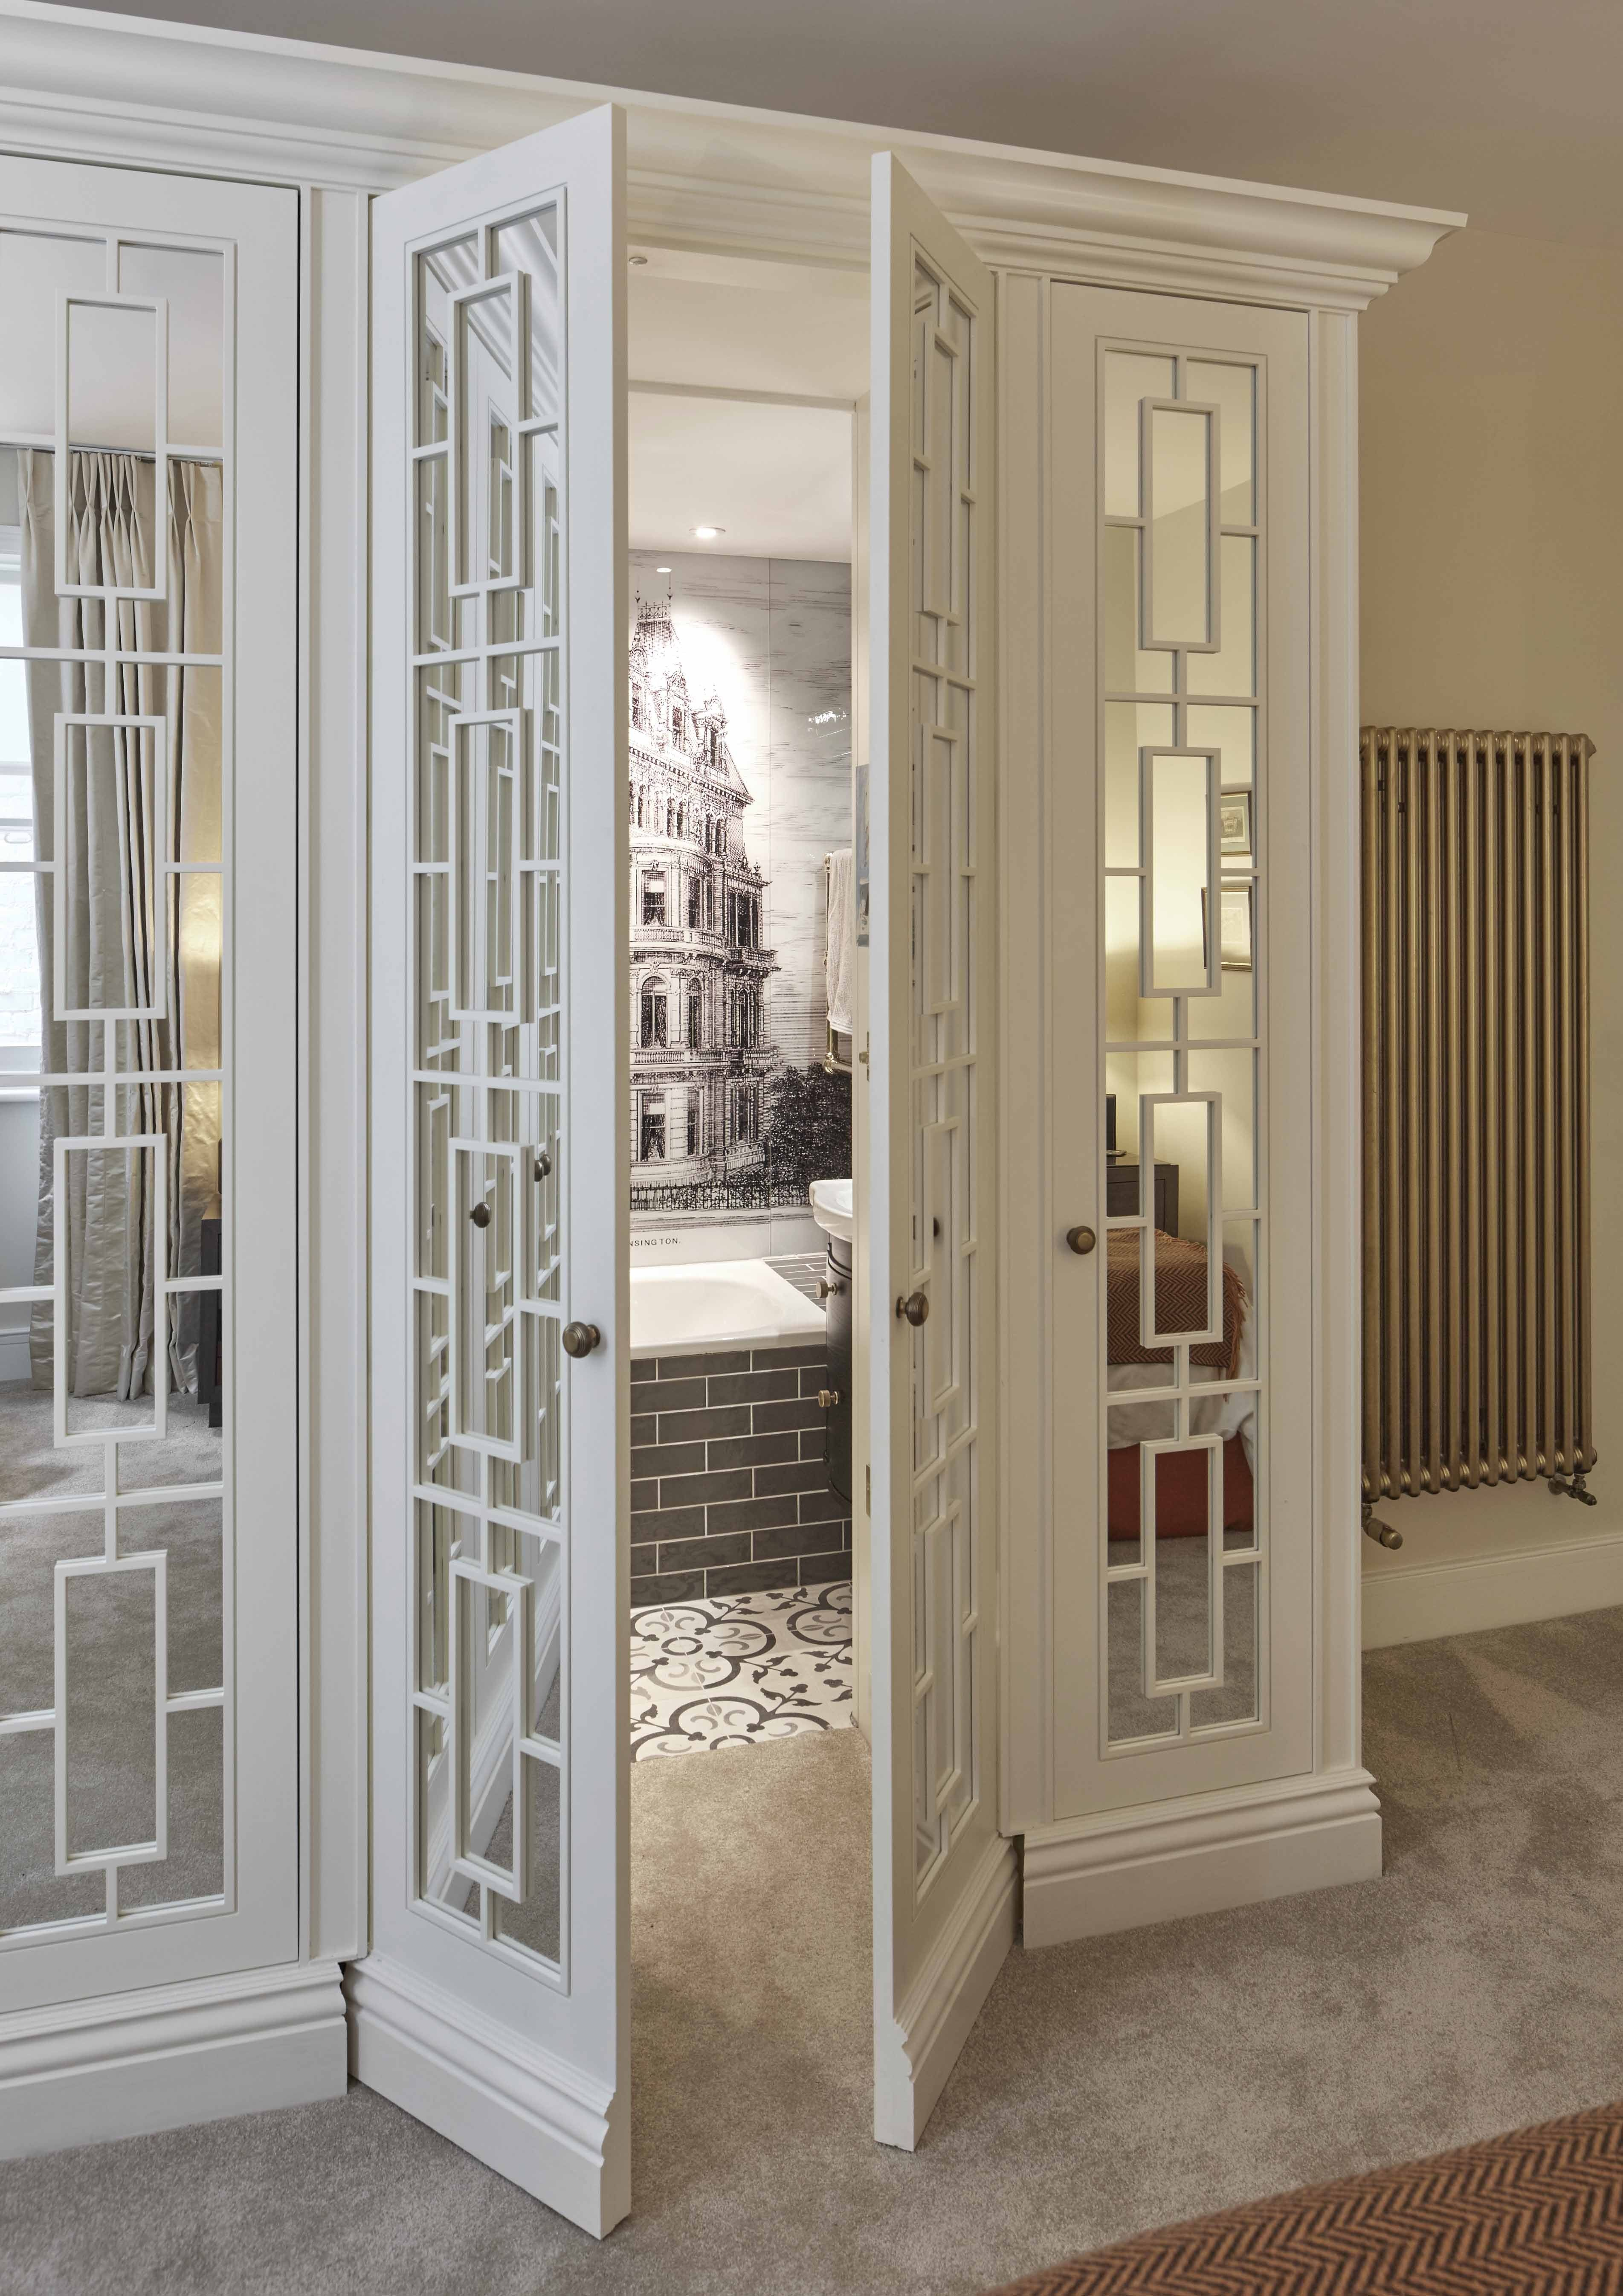 walkin wardrobe the heritage wardrobe company doors. Black Bedroom Furniture Sets. Home Design Ideas